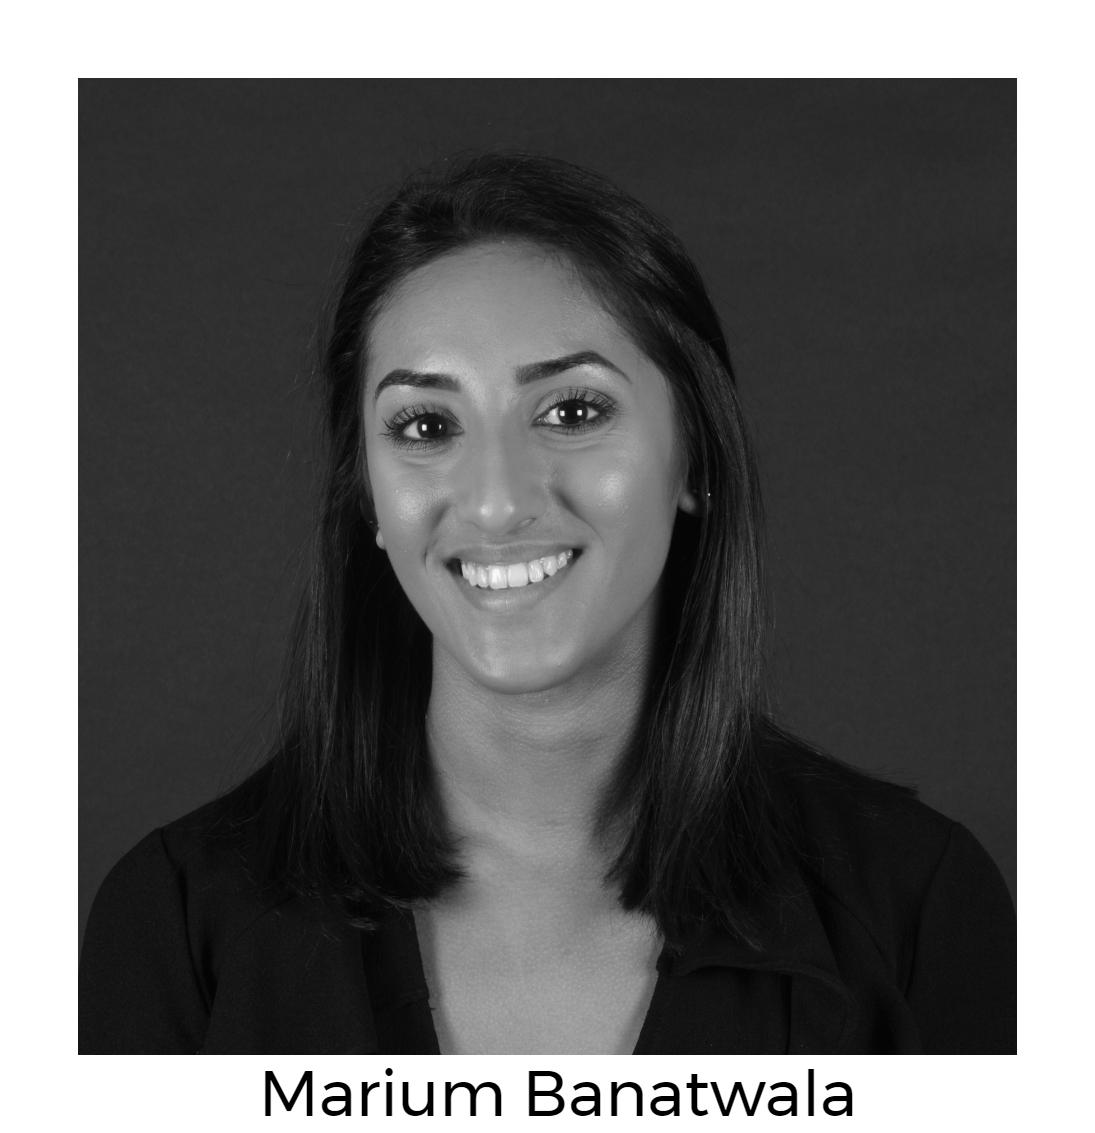 Marium Banatwala